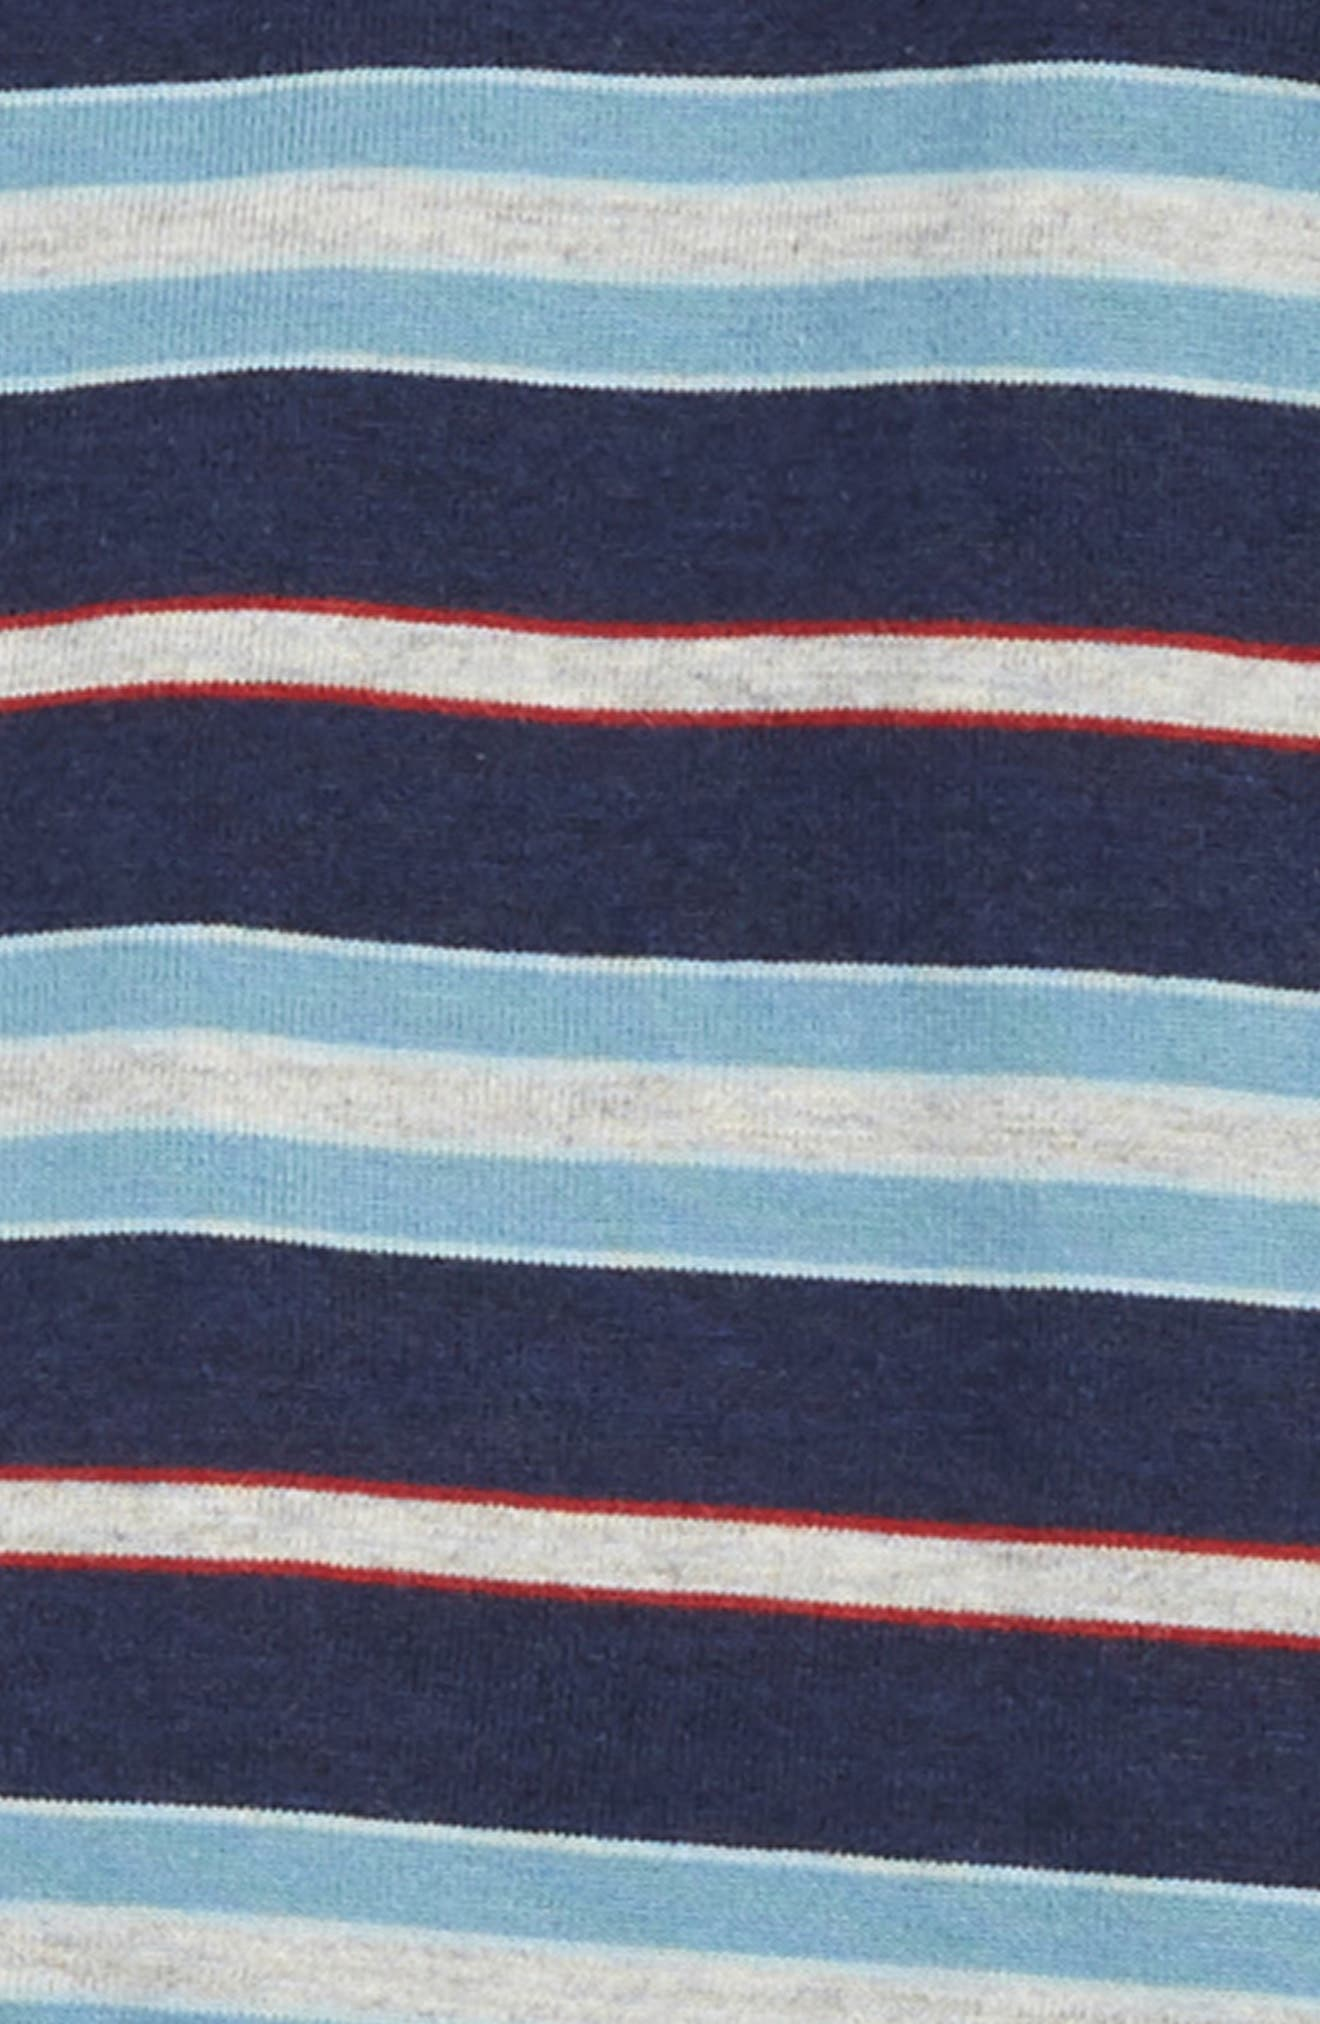 Stripe Top & Sweatpants Set,                             Alternate thumbnail 2, color,                             LIGHT GREY HEATHER